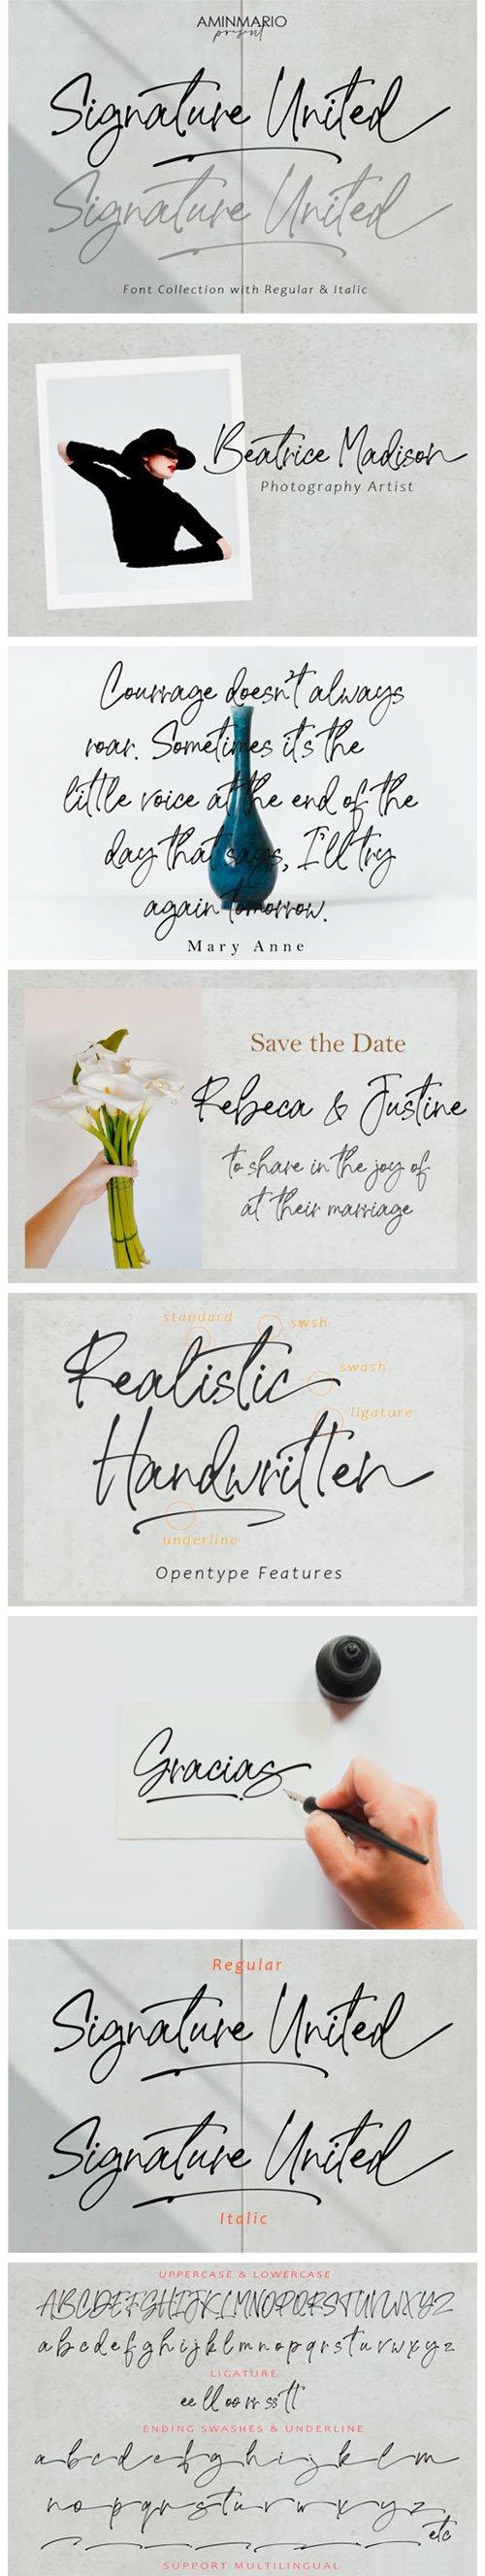 Signature United - Stylish Handwritten Font [2-Weights]